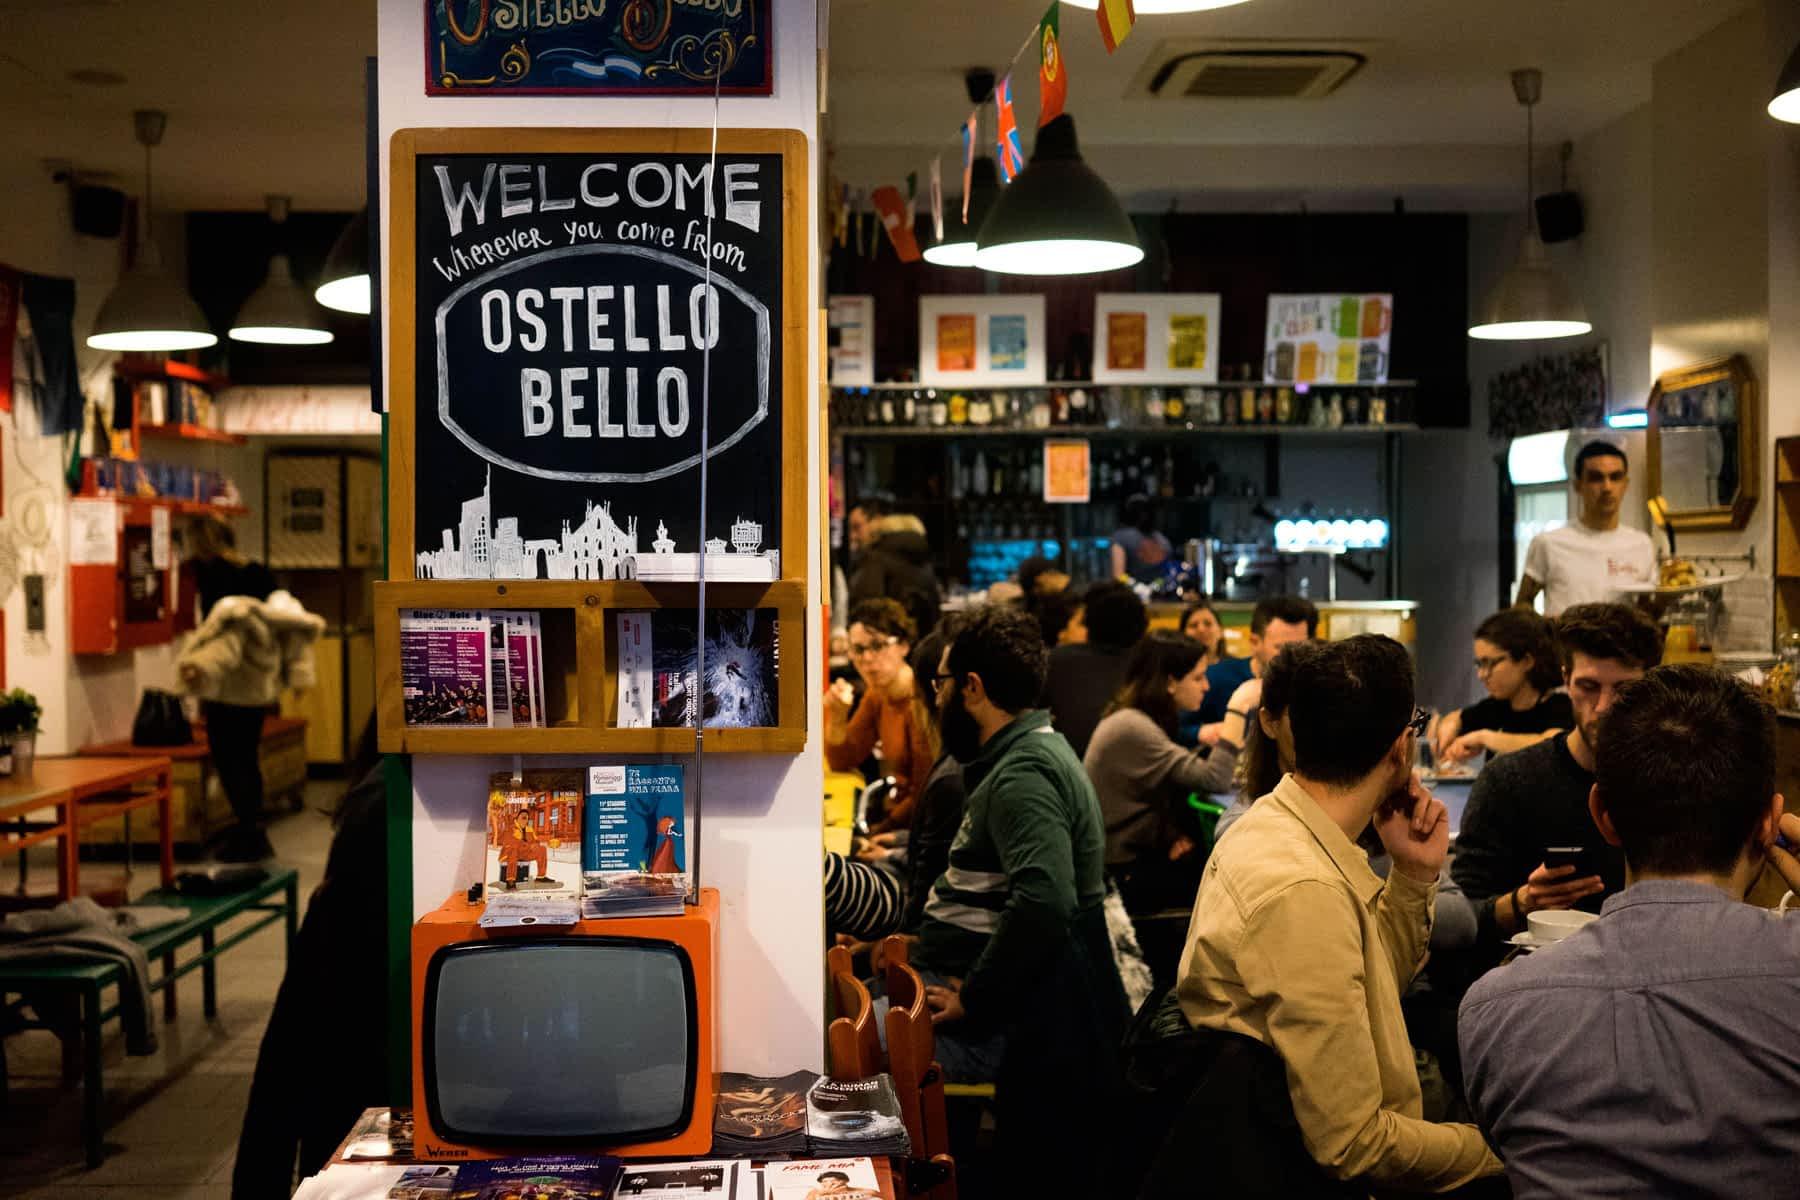 Ostello_Bello_Milano Bar mit Leuten